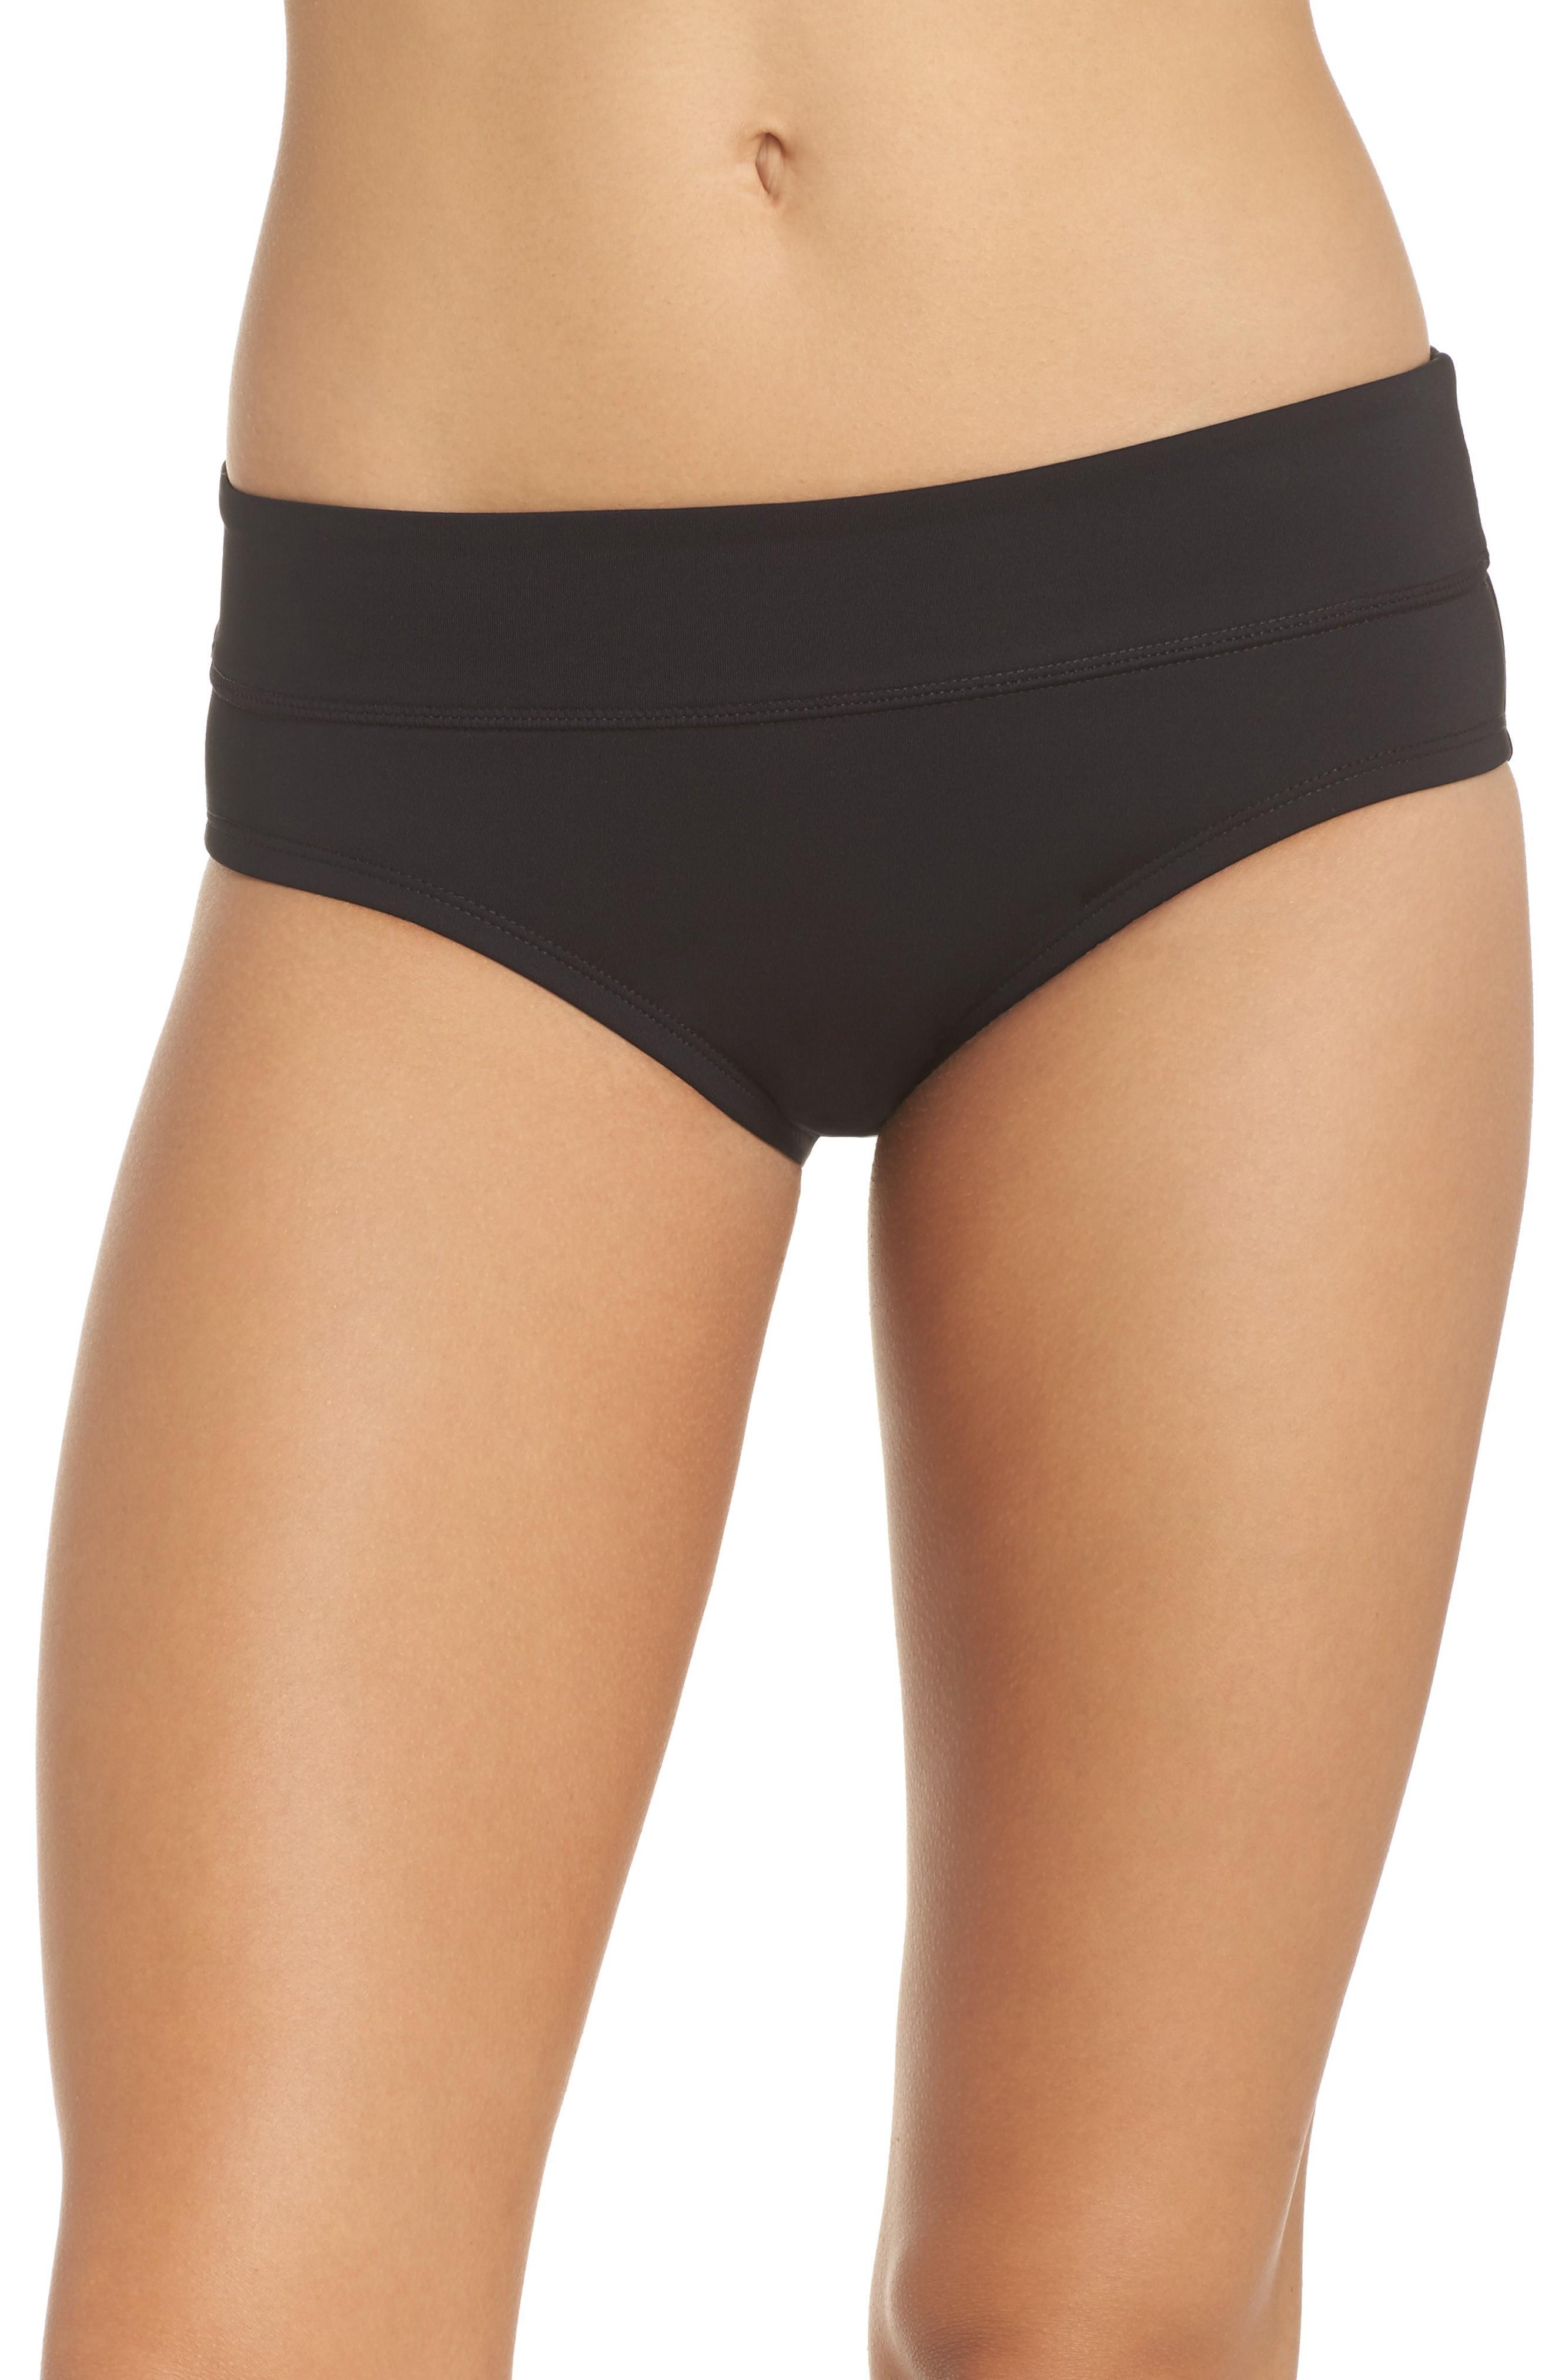 029872a9a Nike Full Bikini Bottoms In Black | ModeSens